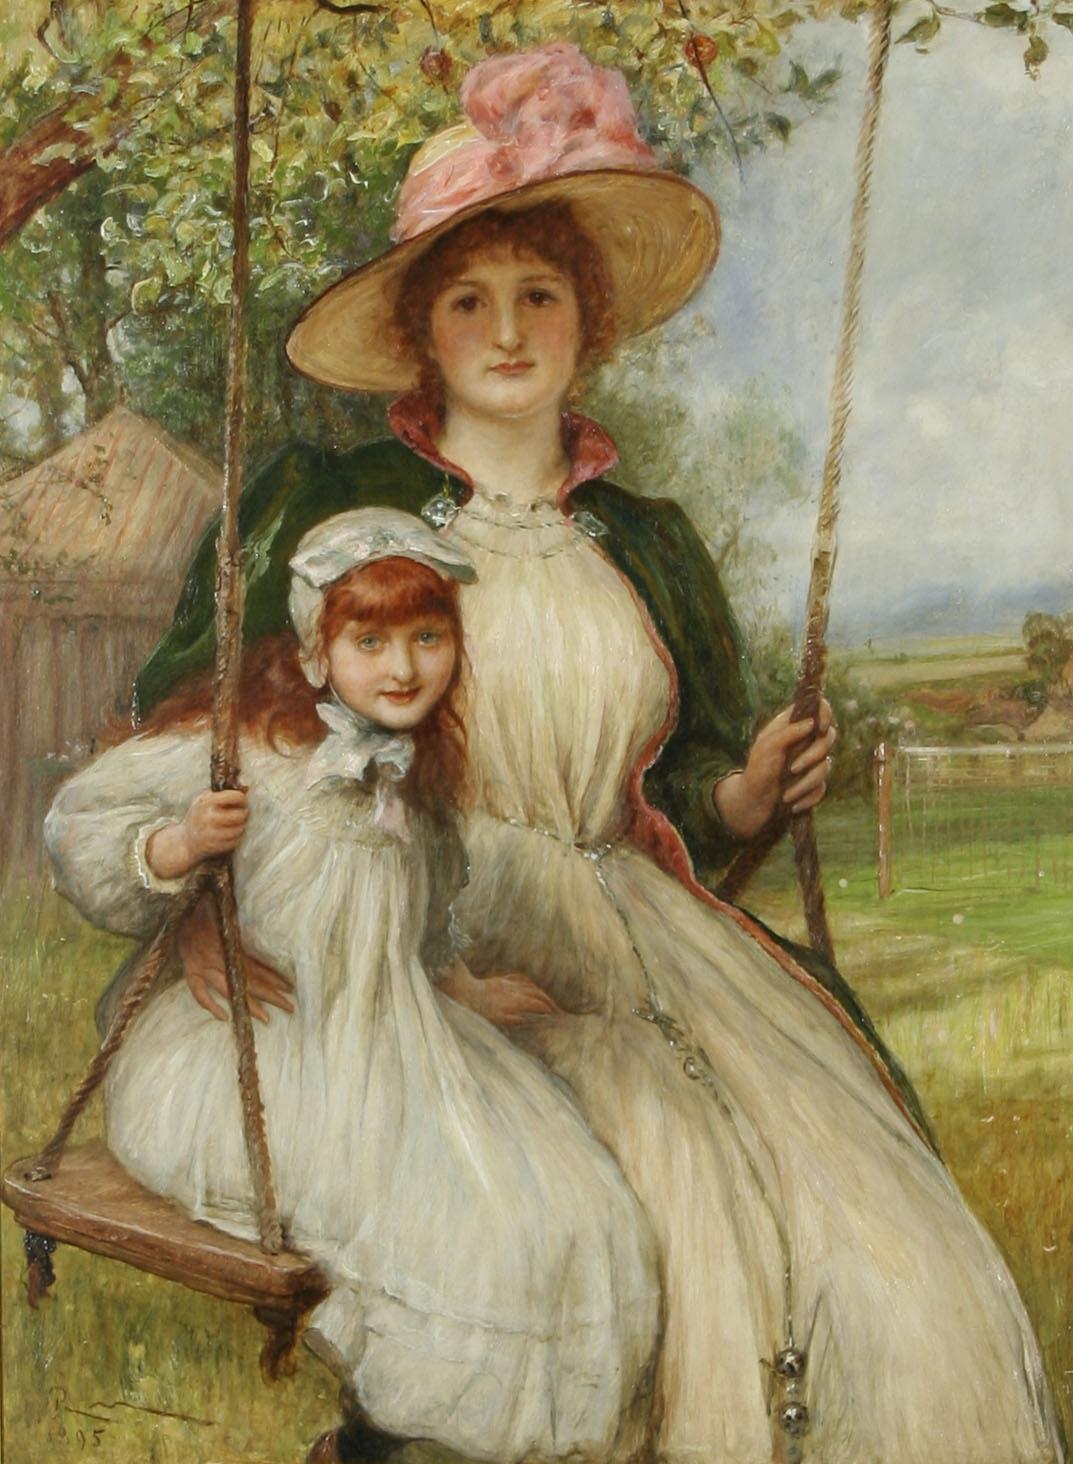 Filerobert Walker Mac Beth Mother And Daughter On A Swing Happy